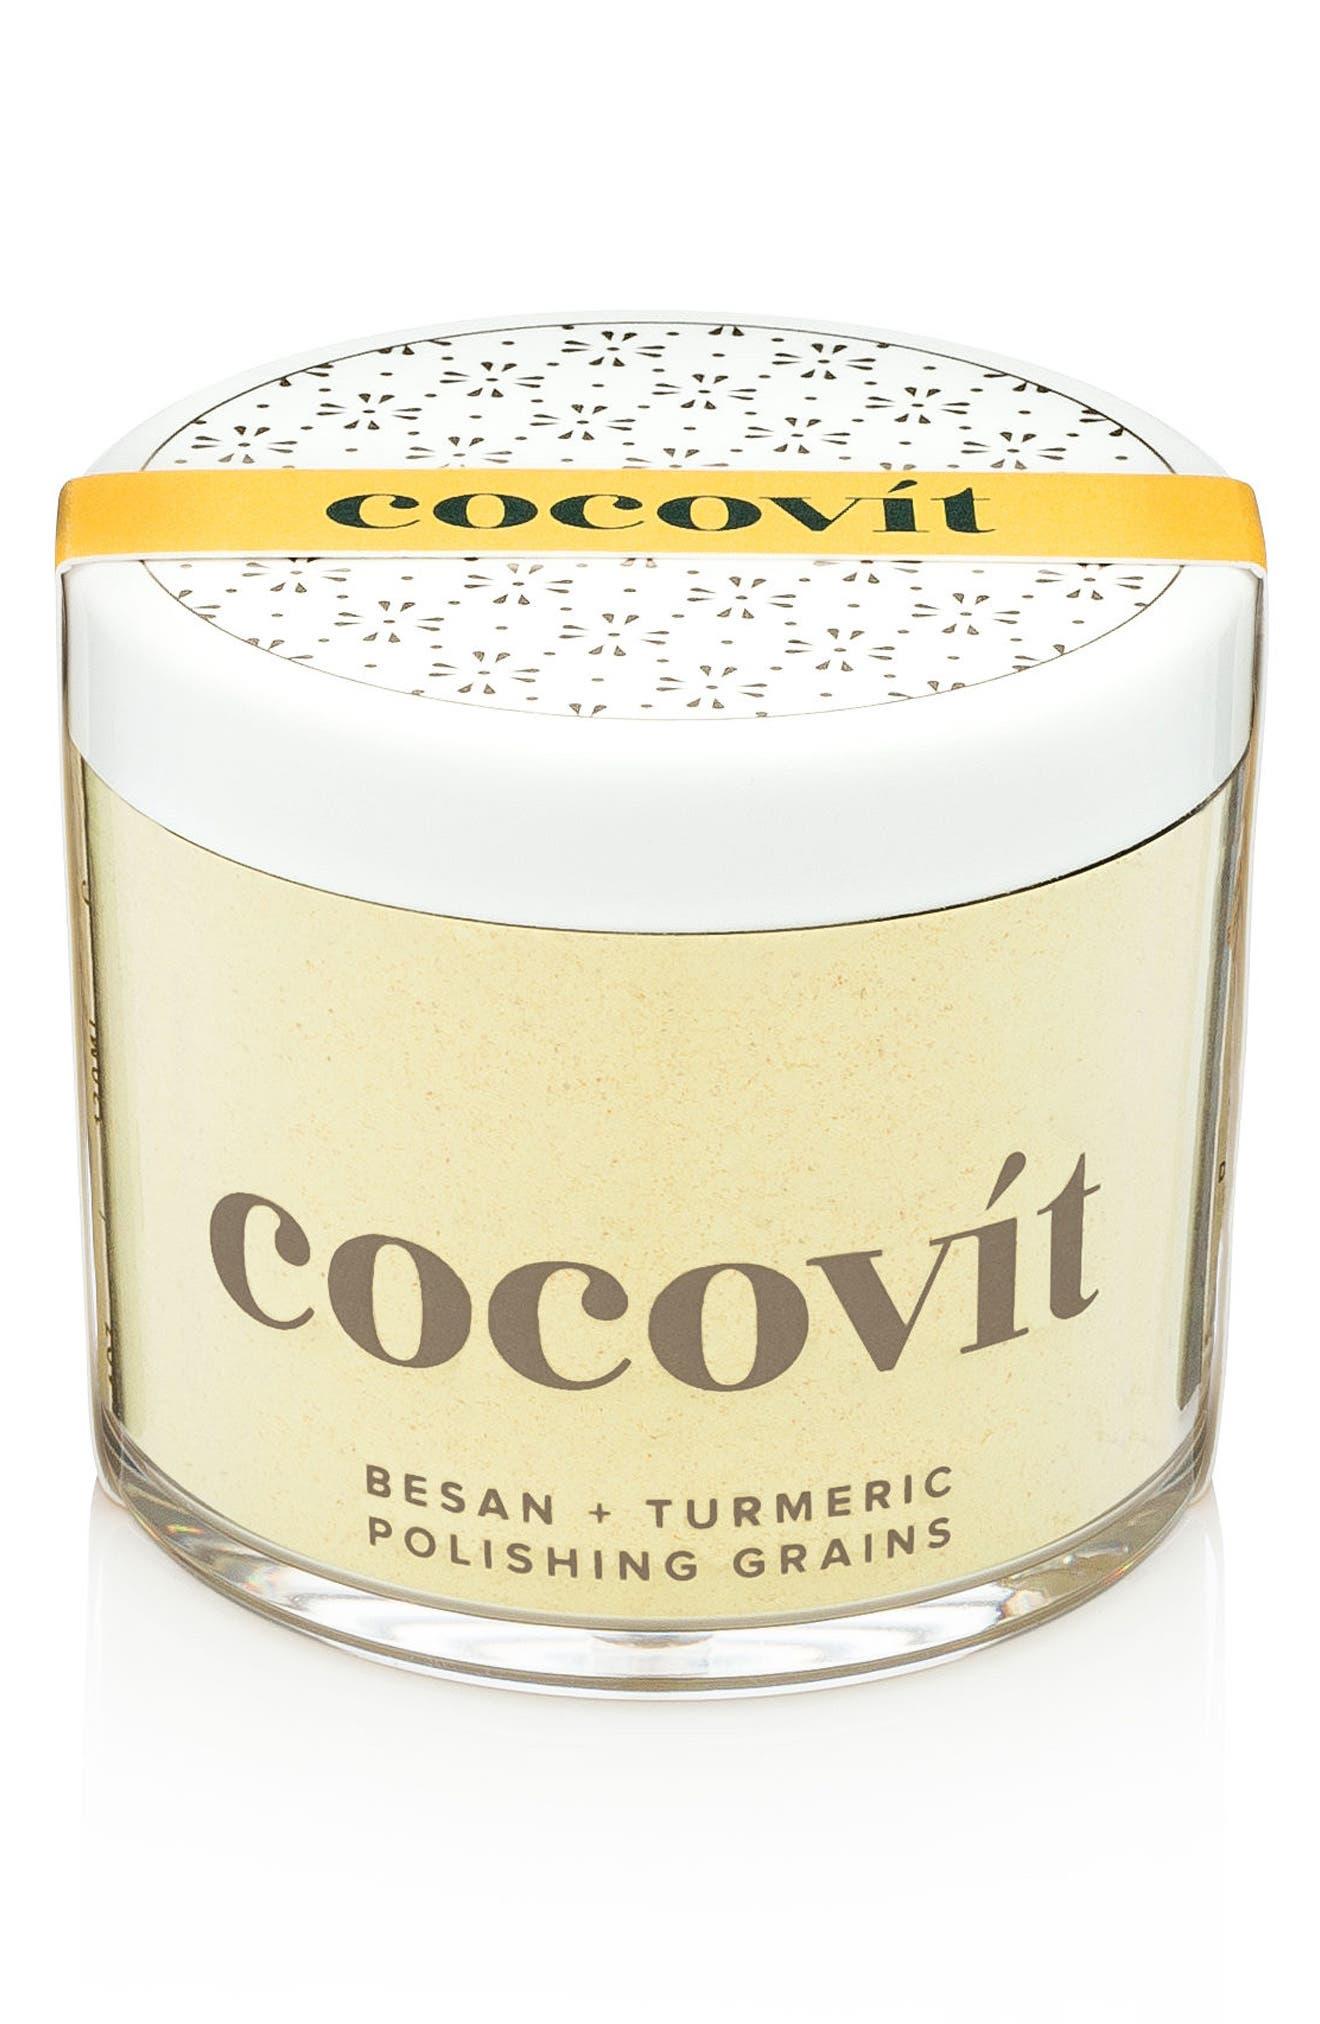 Main Image - Cocovit Besan + Turmeric Polishing Grains